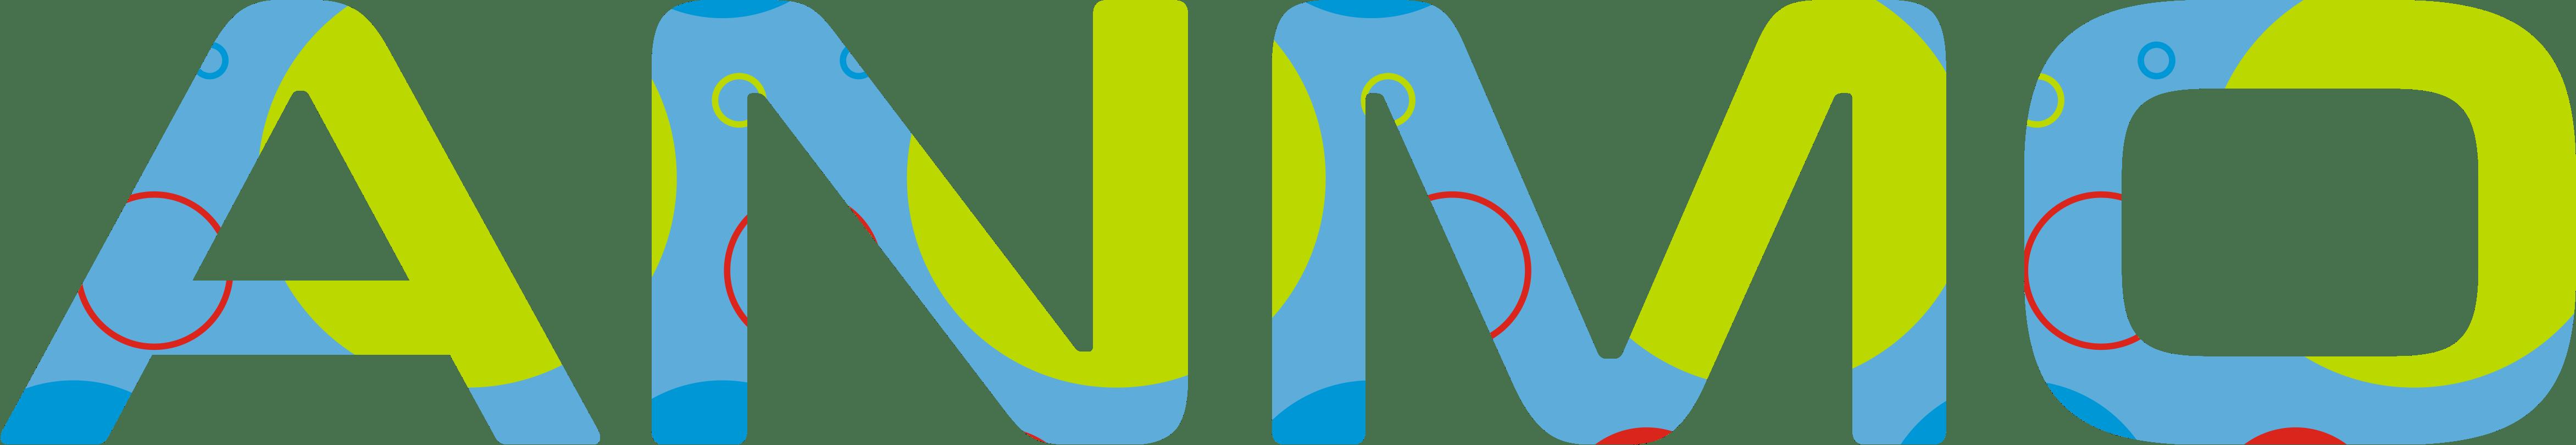 CABINA DE CONTROL ANTICORONAVIRUS